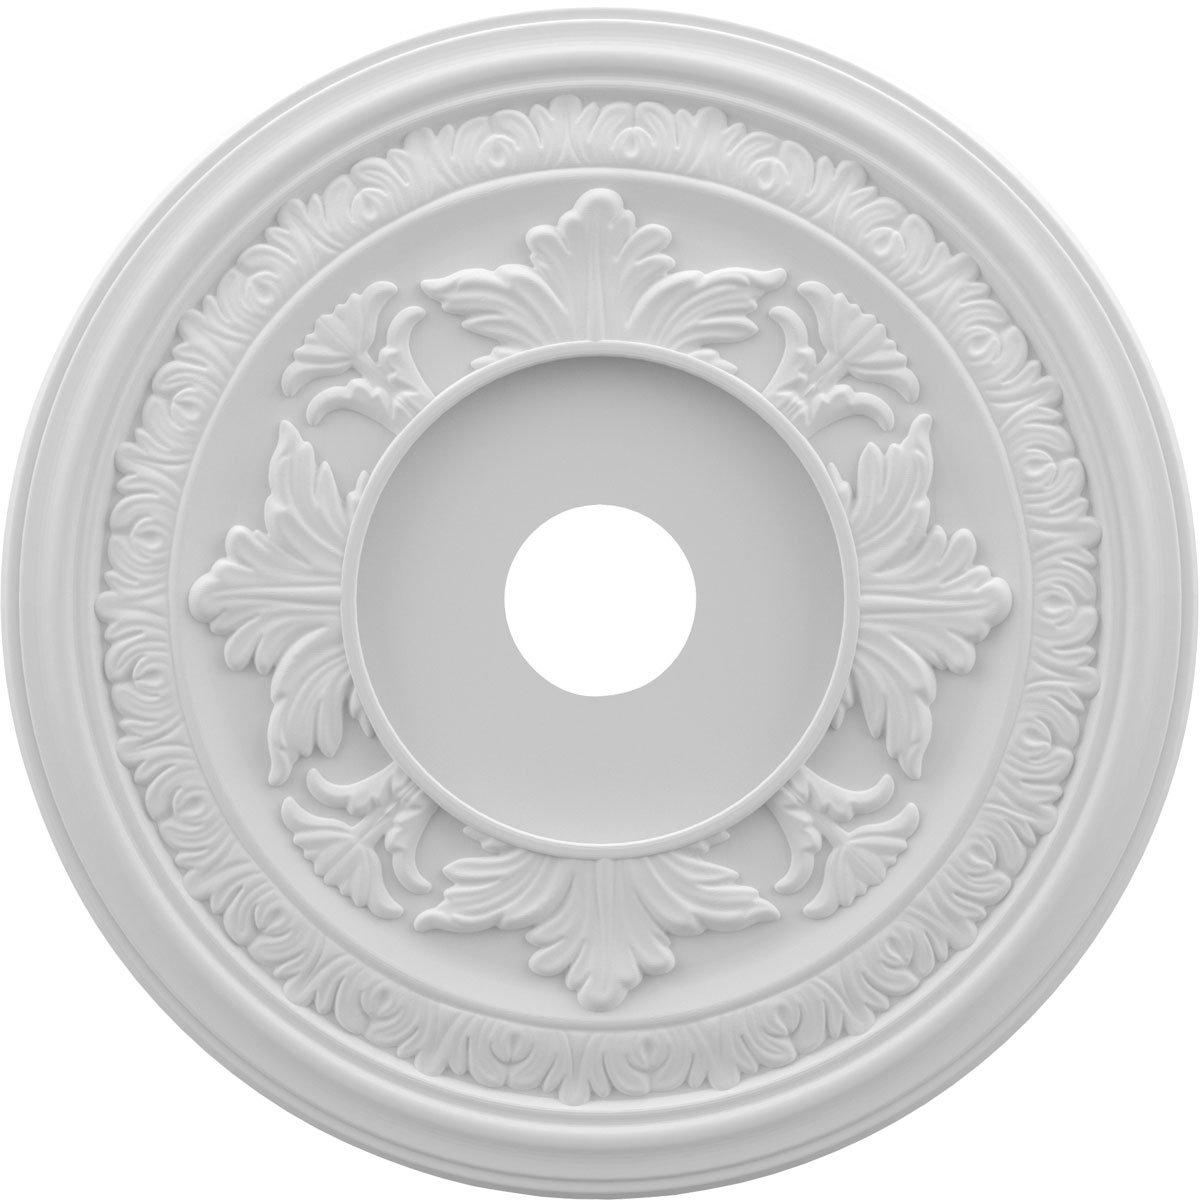 Ekena Millwork CMP22BA Baltimore Medallion Thermoformed Pvc Ceiling, 22'' OD x 3 1/2'' ID x 1'' P, White